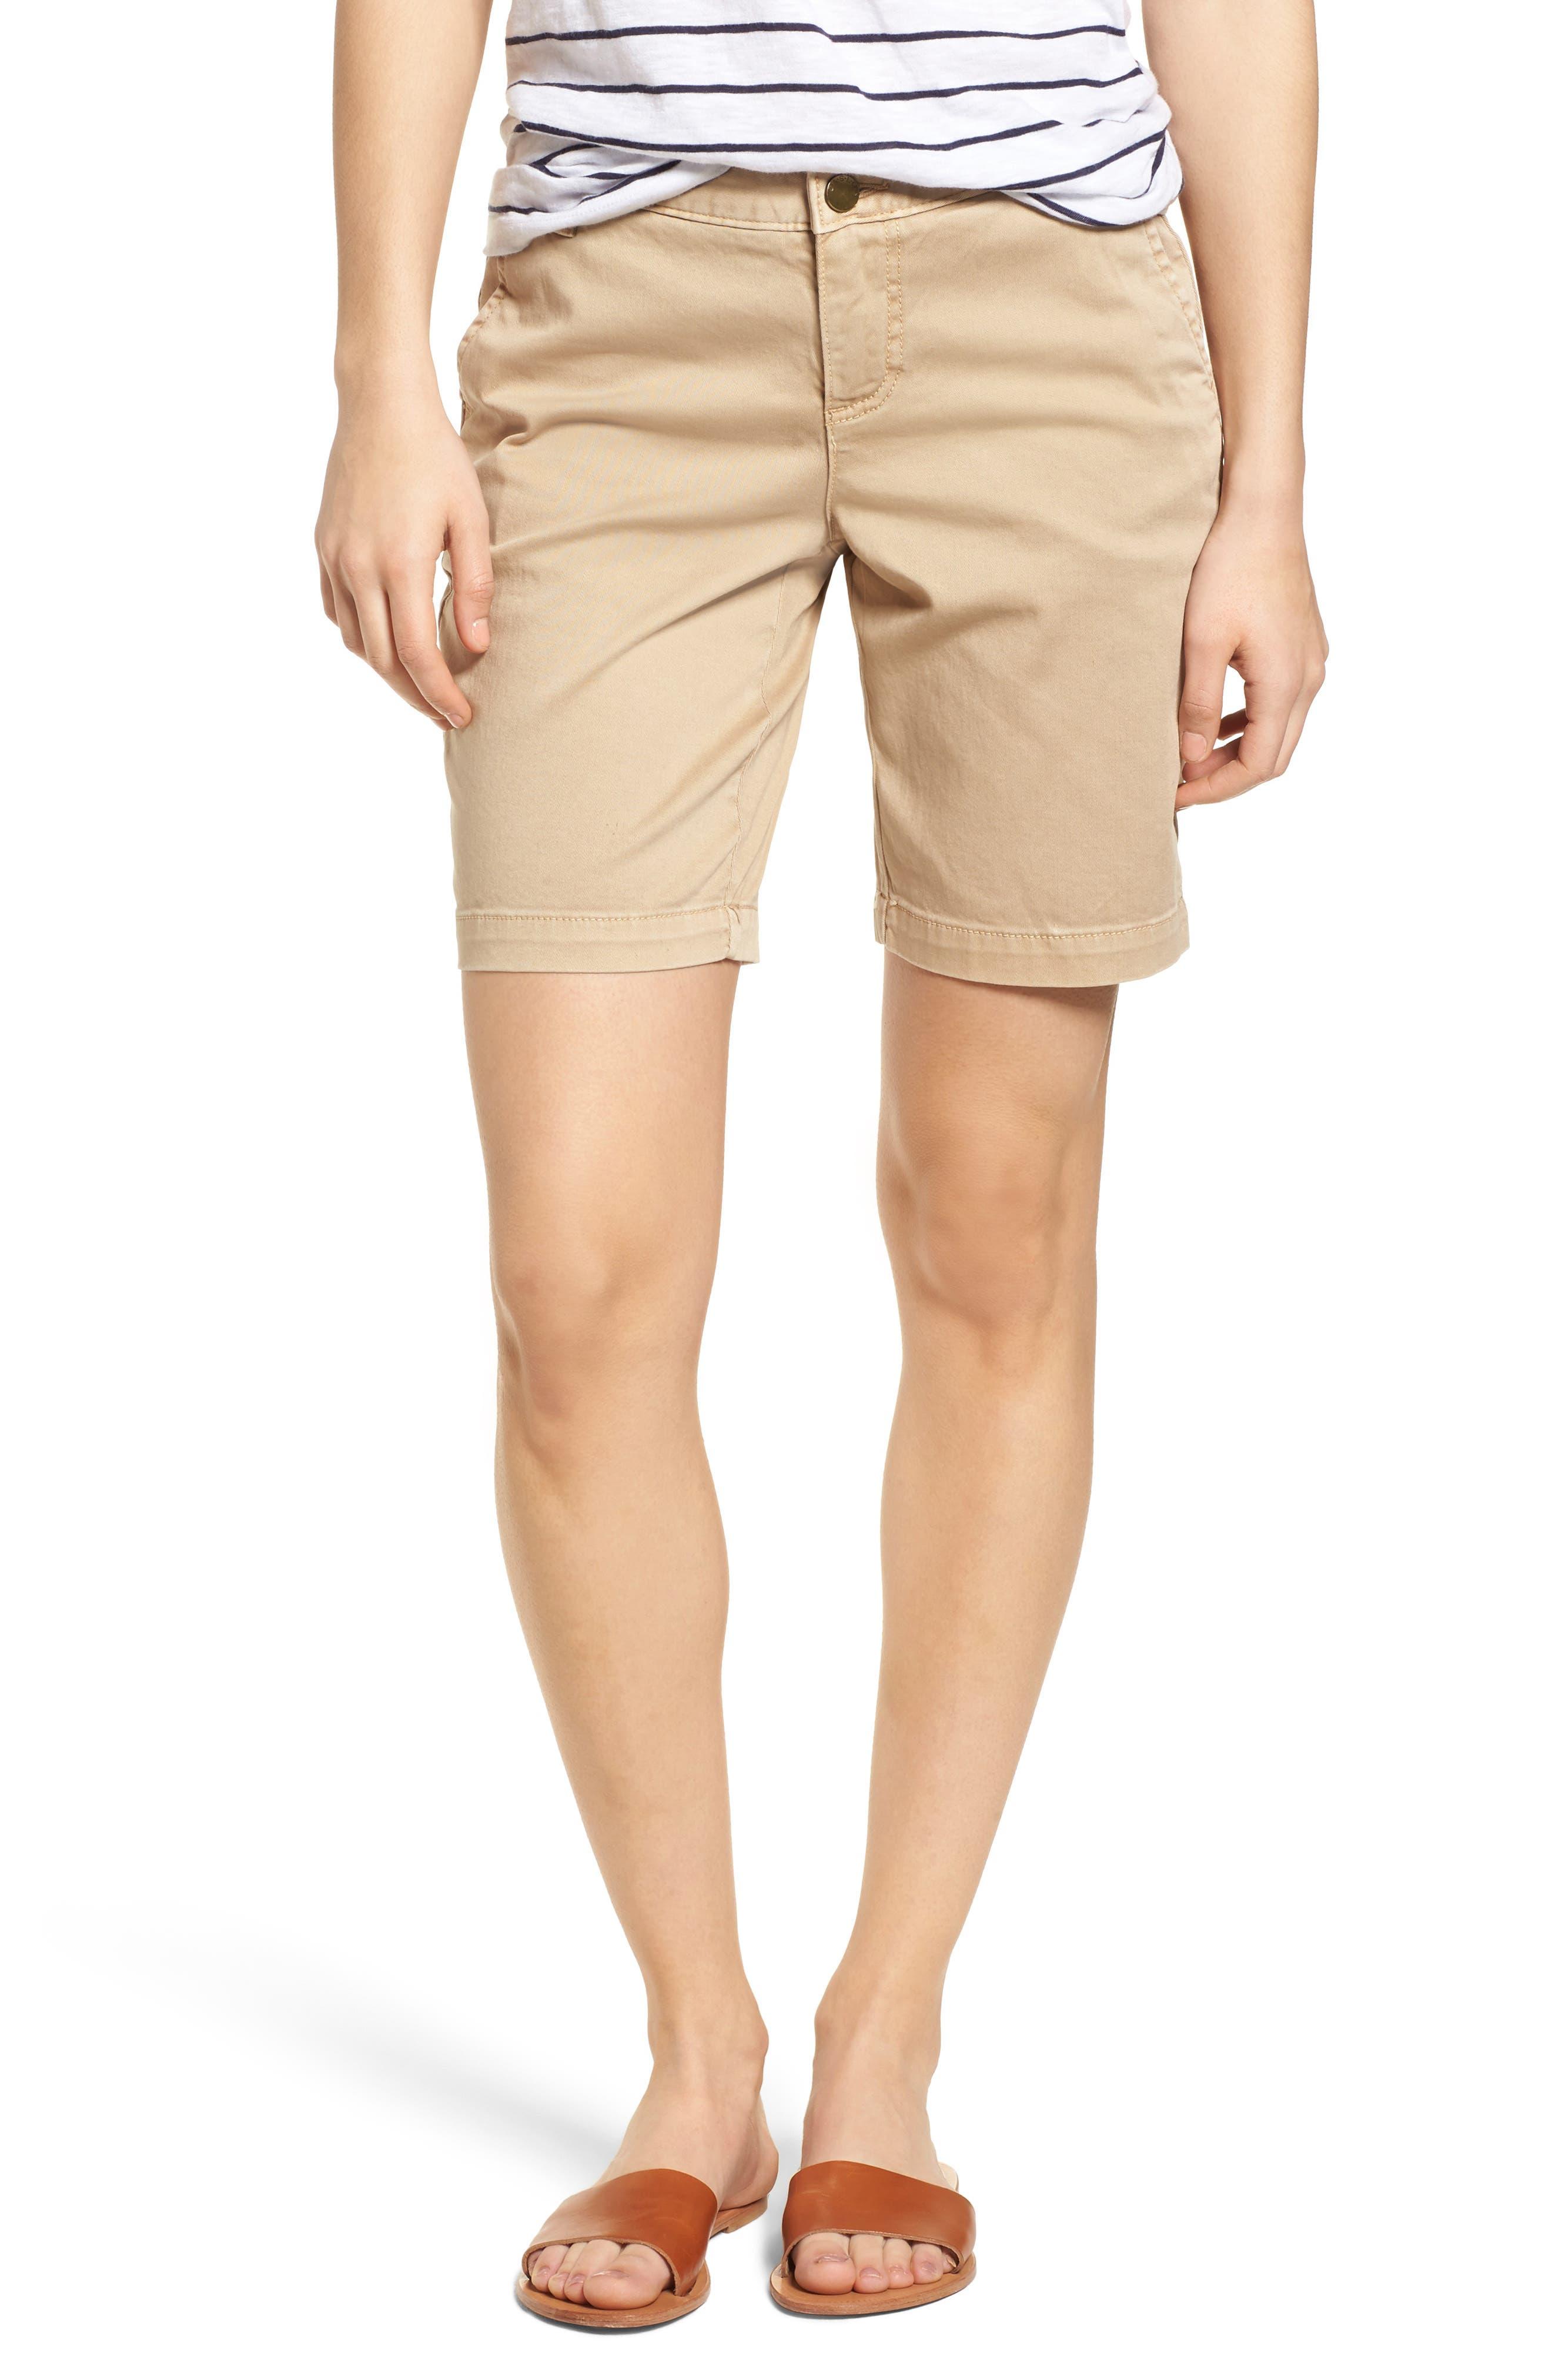 beige shorts womens